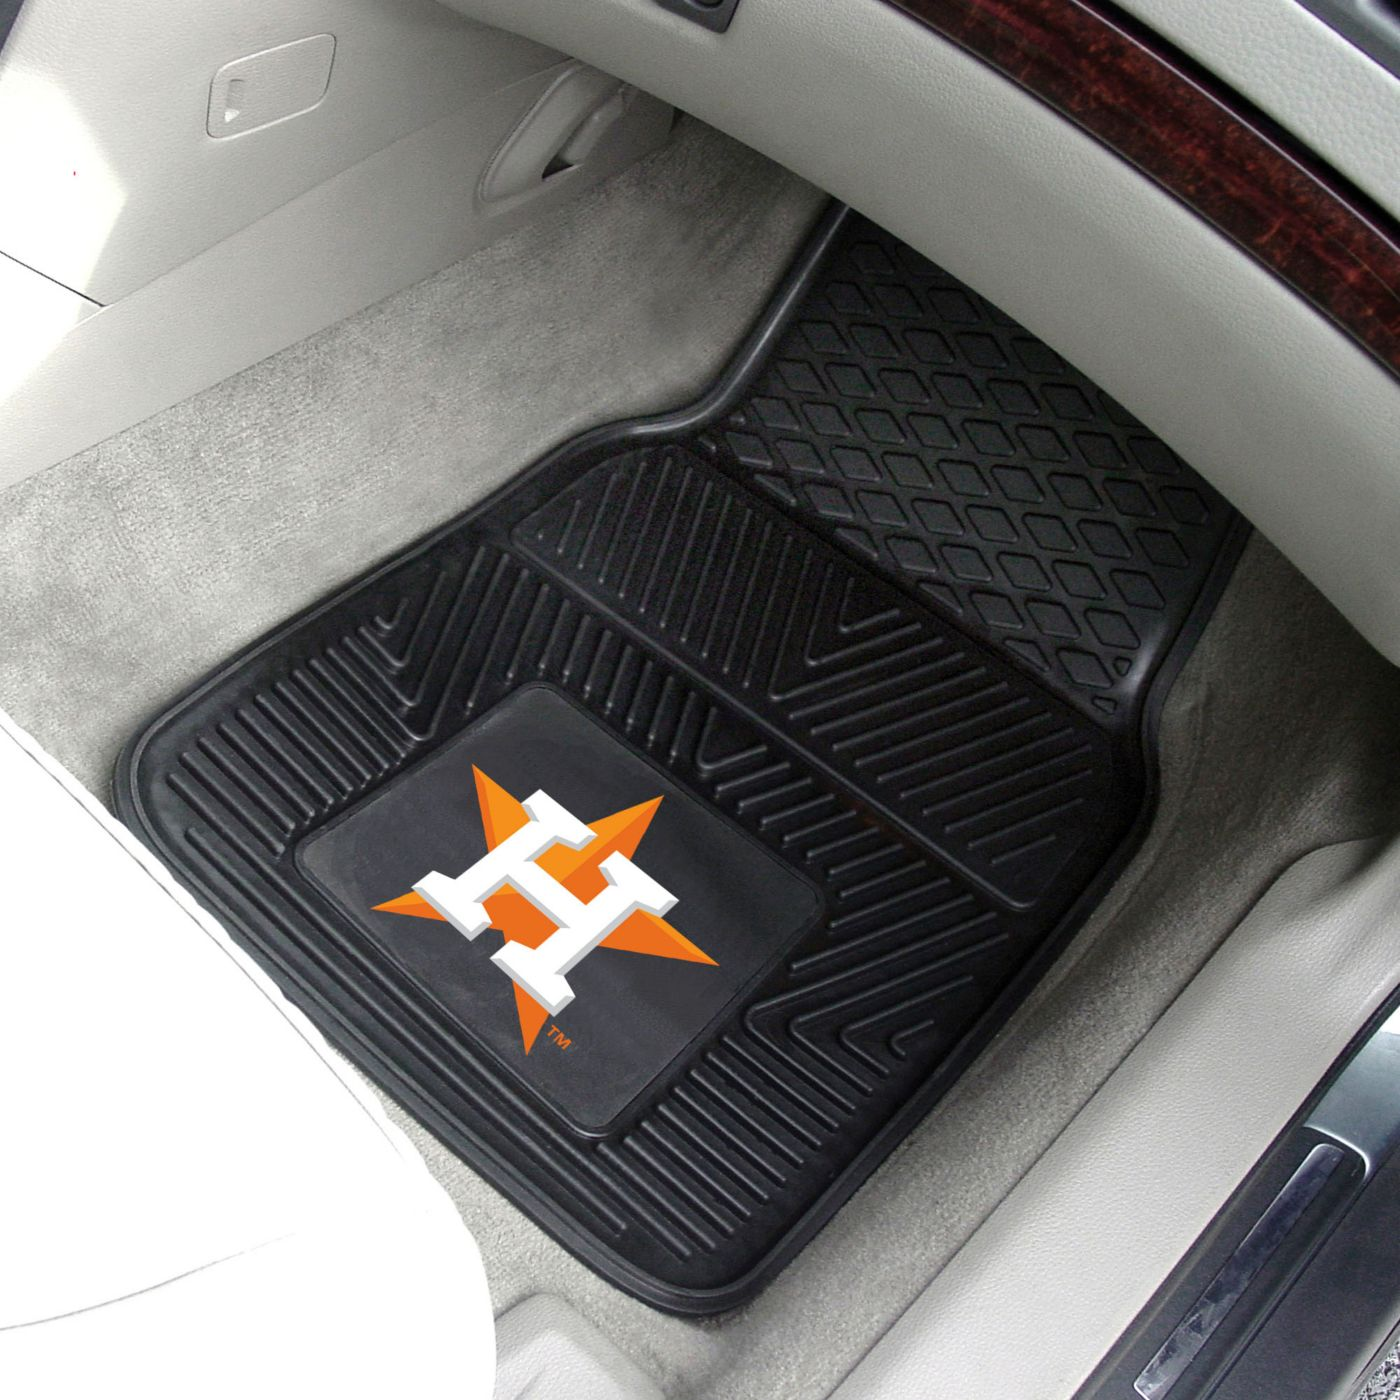 FANMATS Houston Astros Heavy Duty Vinyl Car Mats 2-Pack